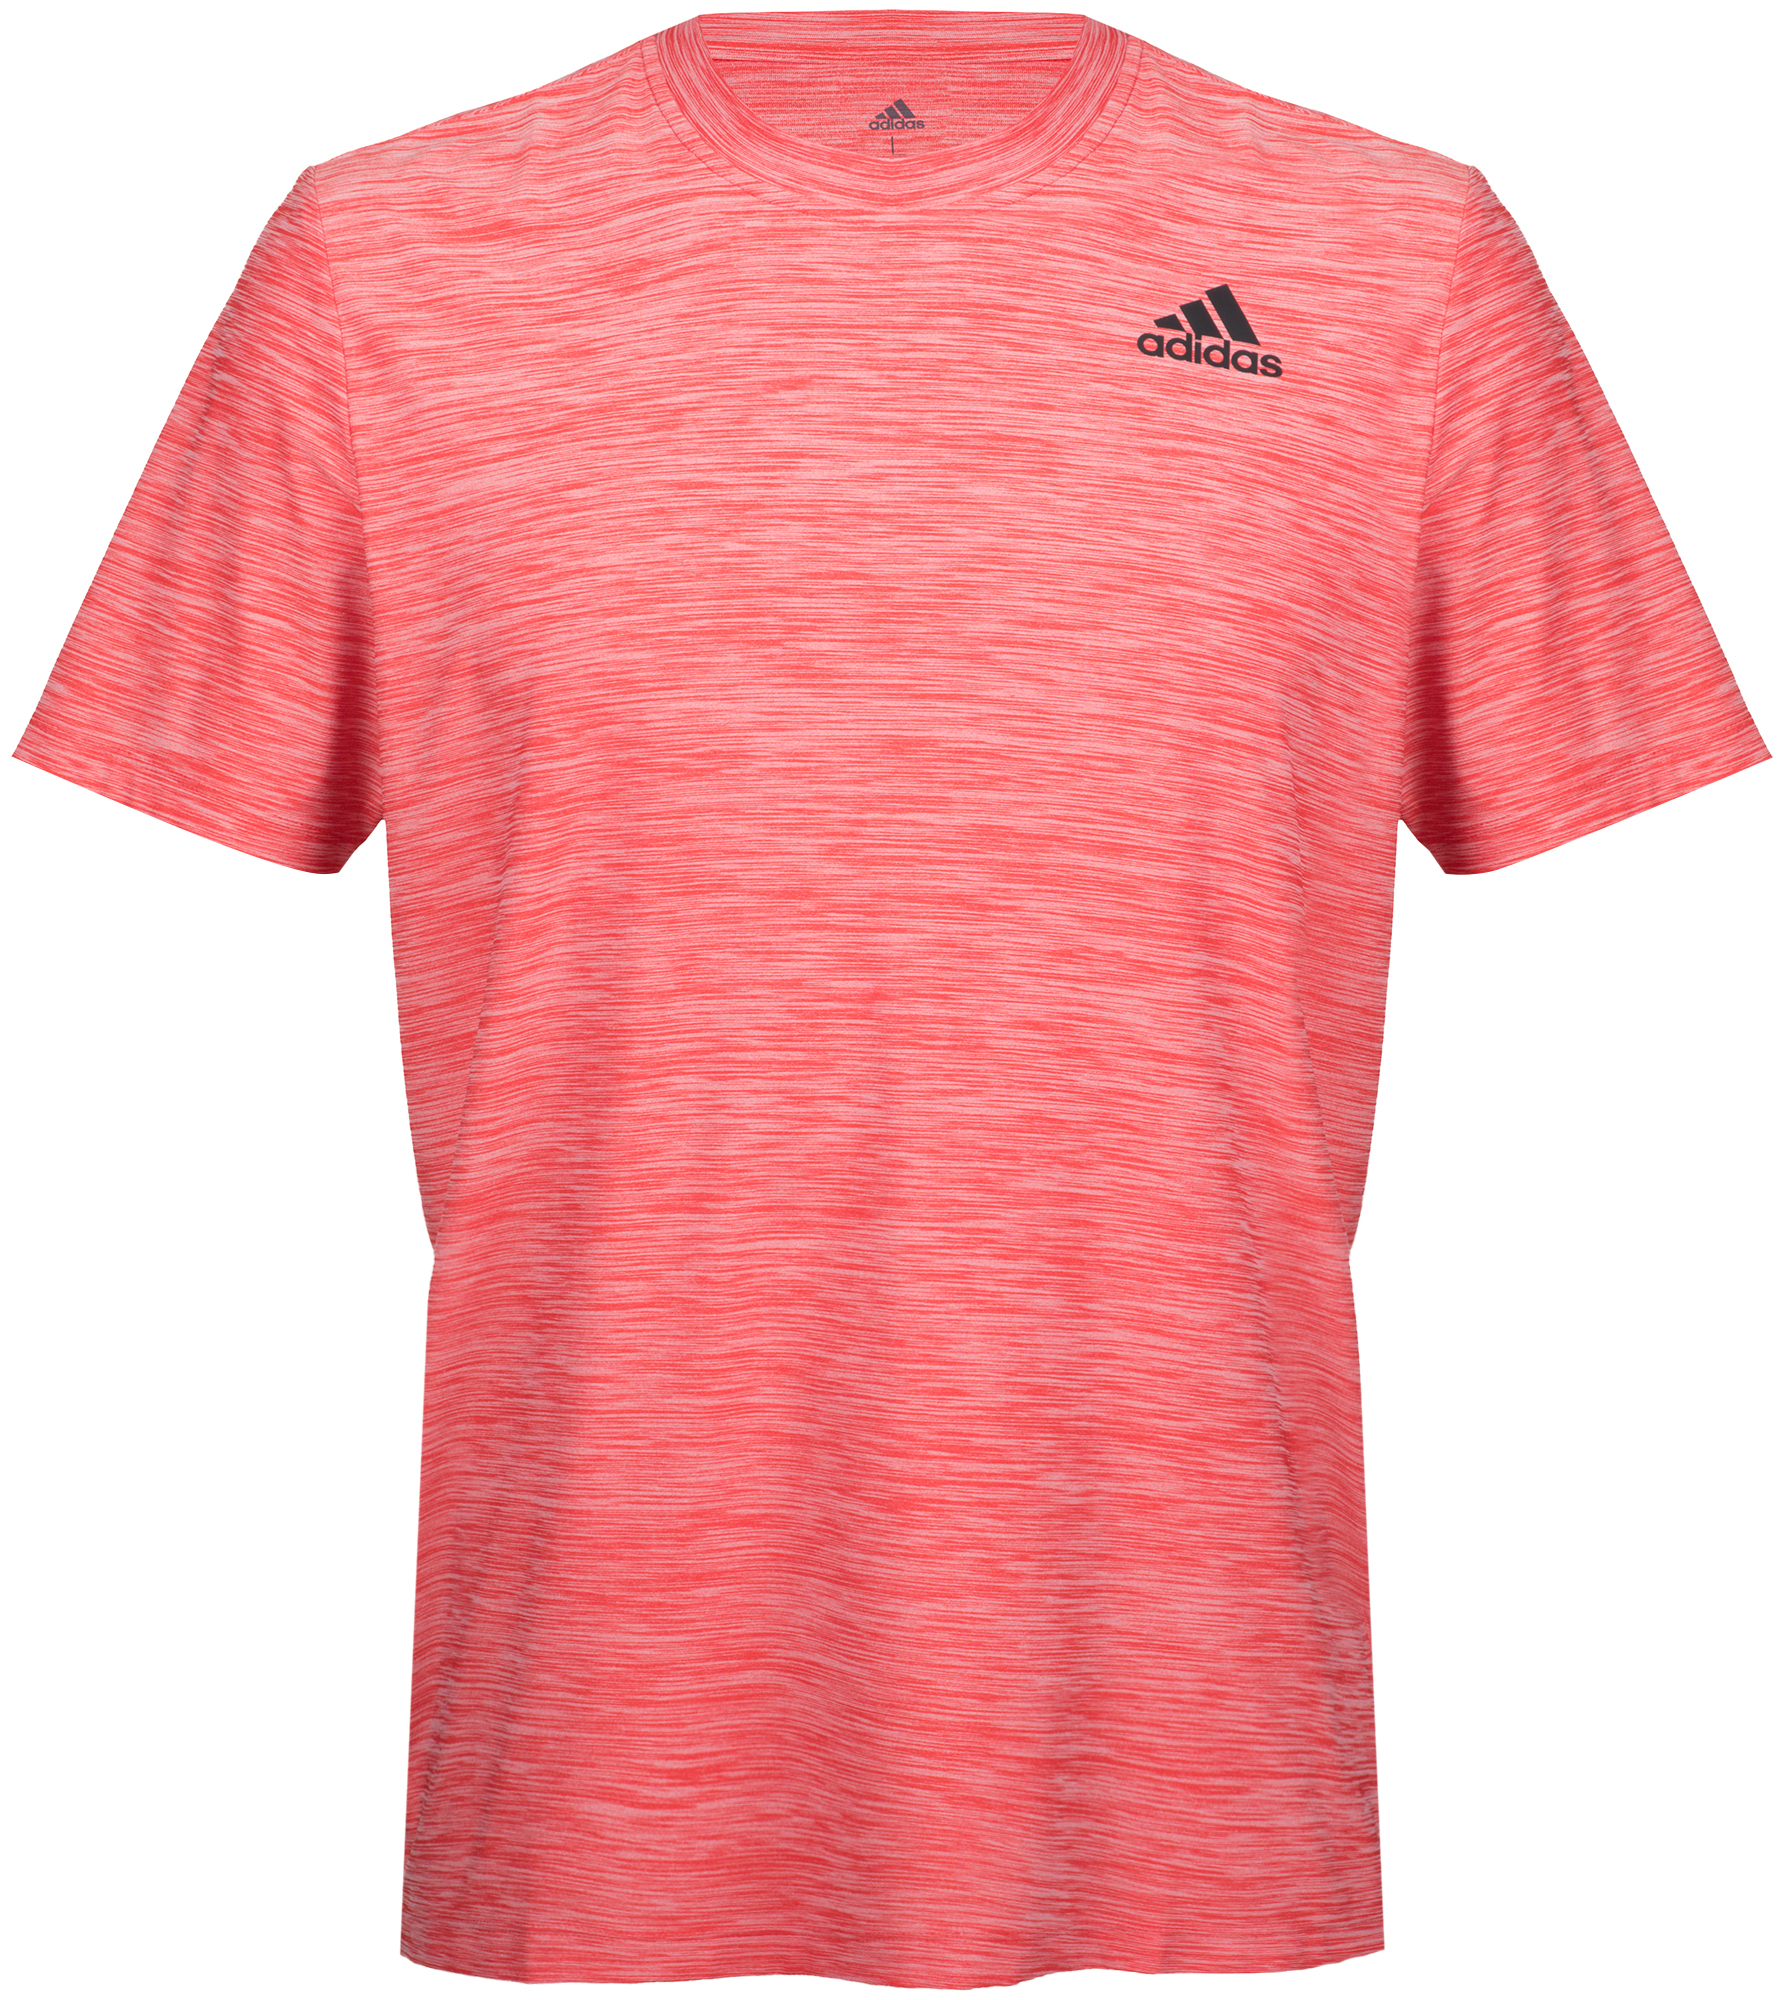 Adidas Футболка мужская adidas All Set, размер 48-50 adidas all court